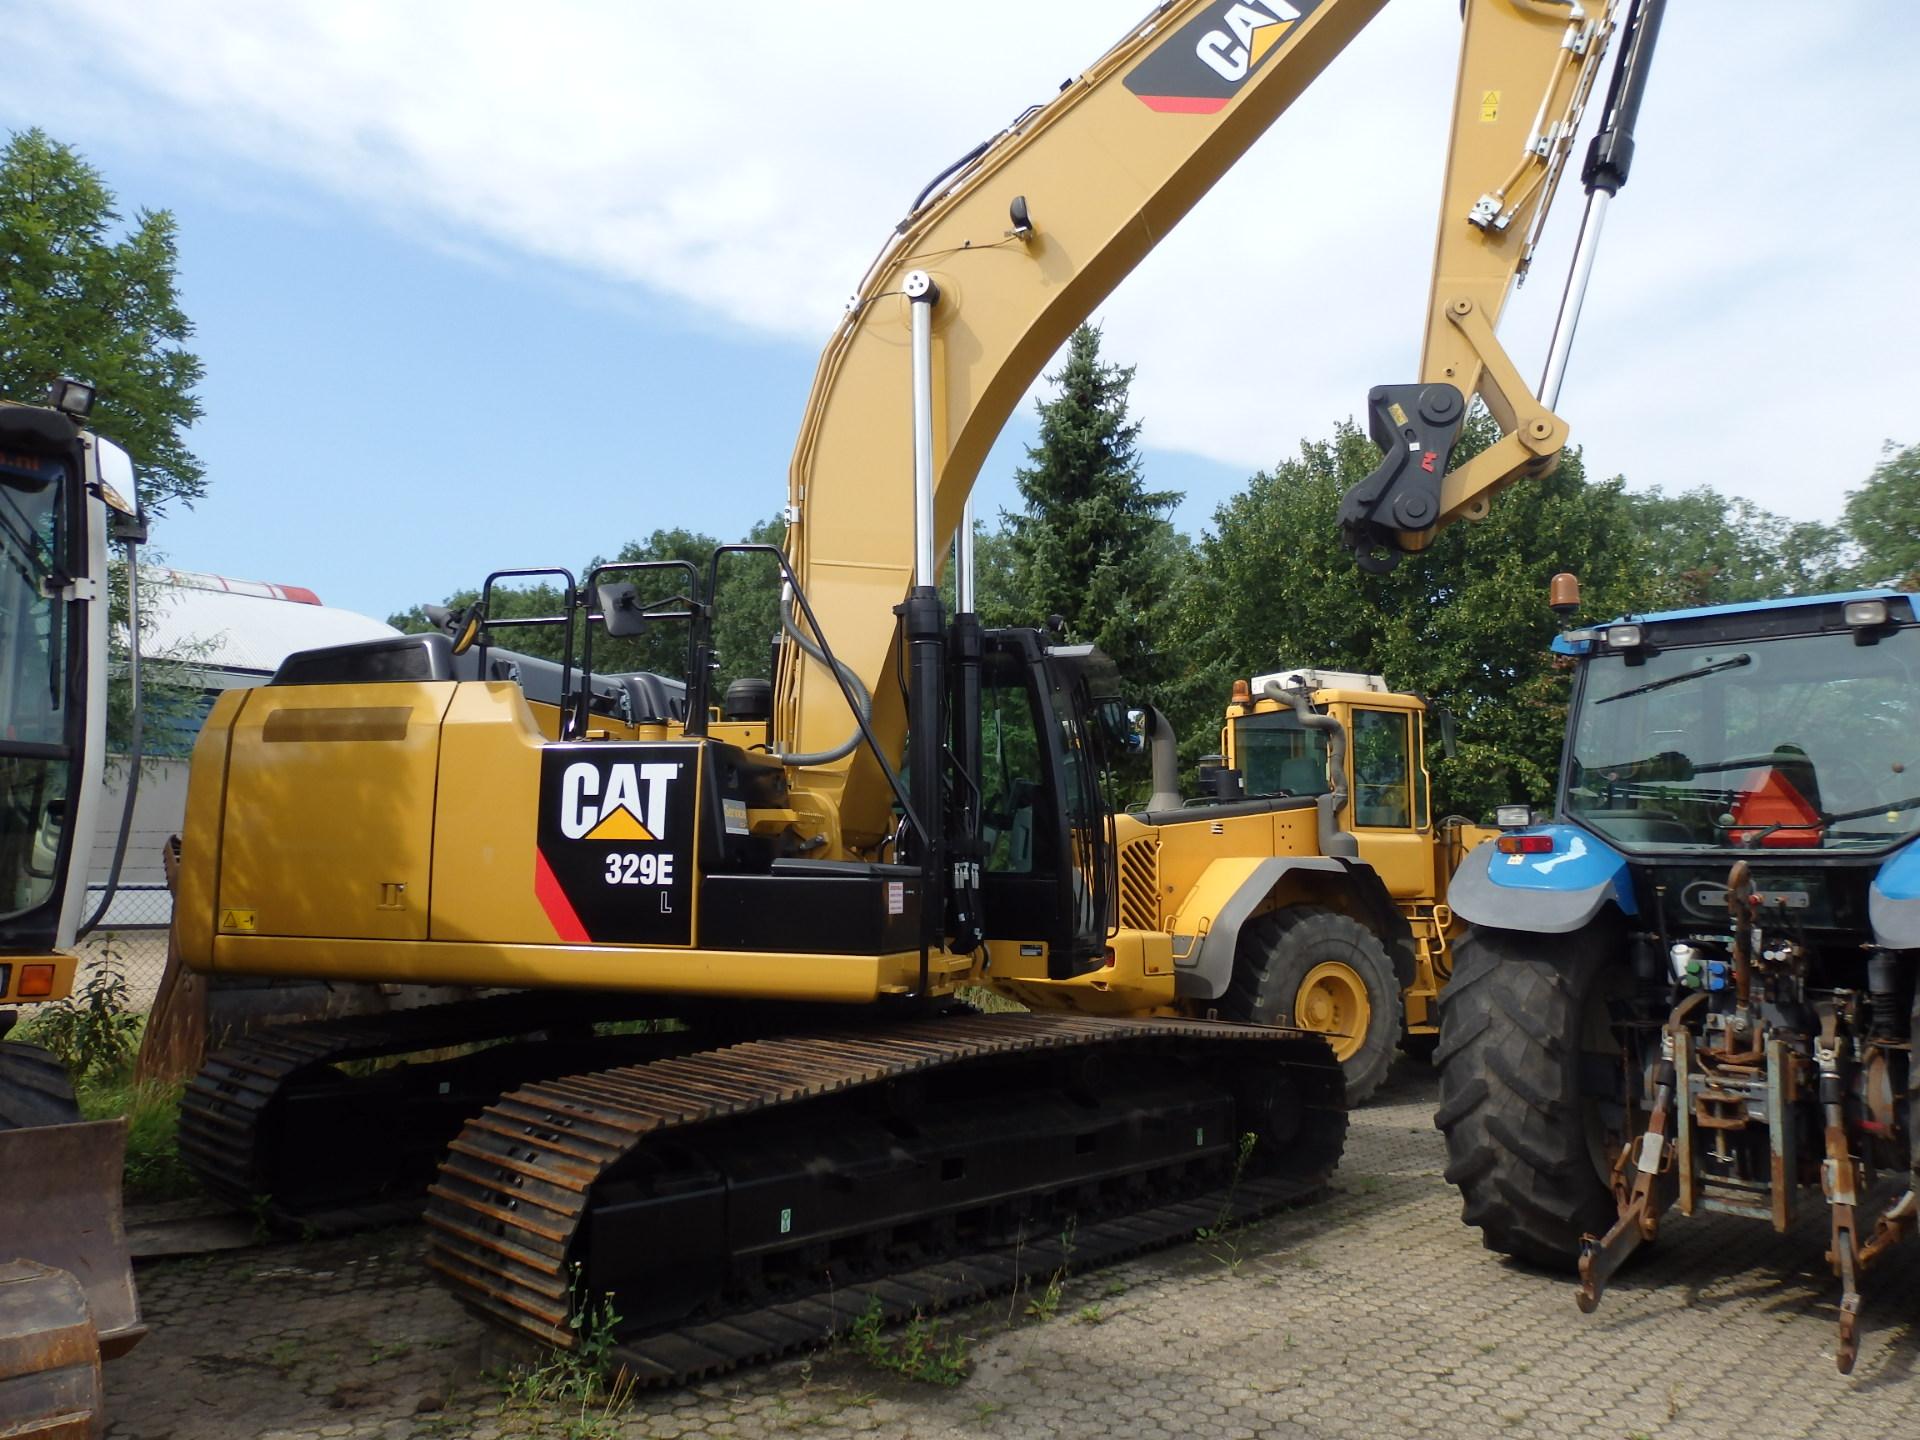 Caterpillar 329EL – Sold